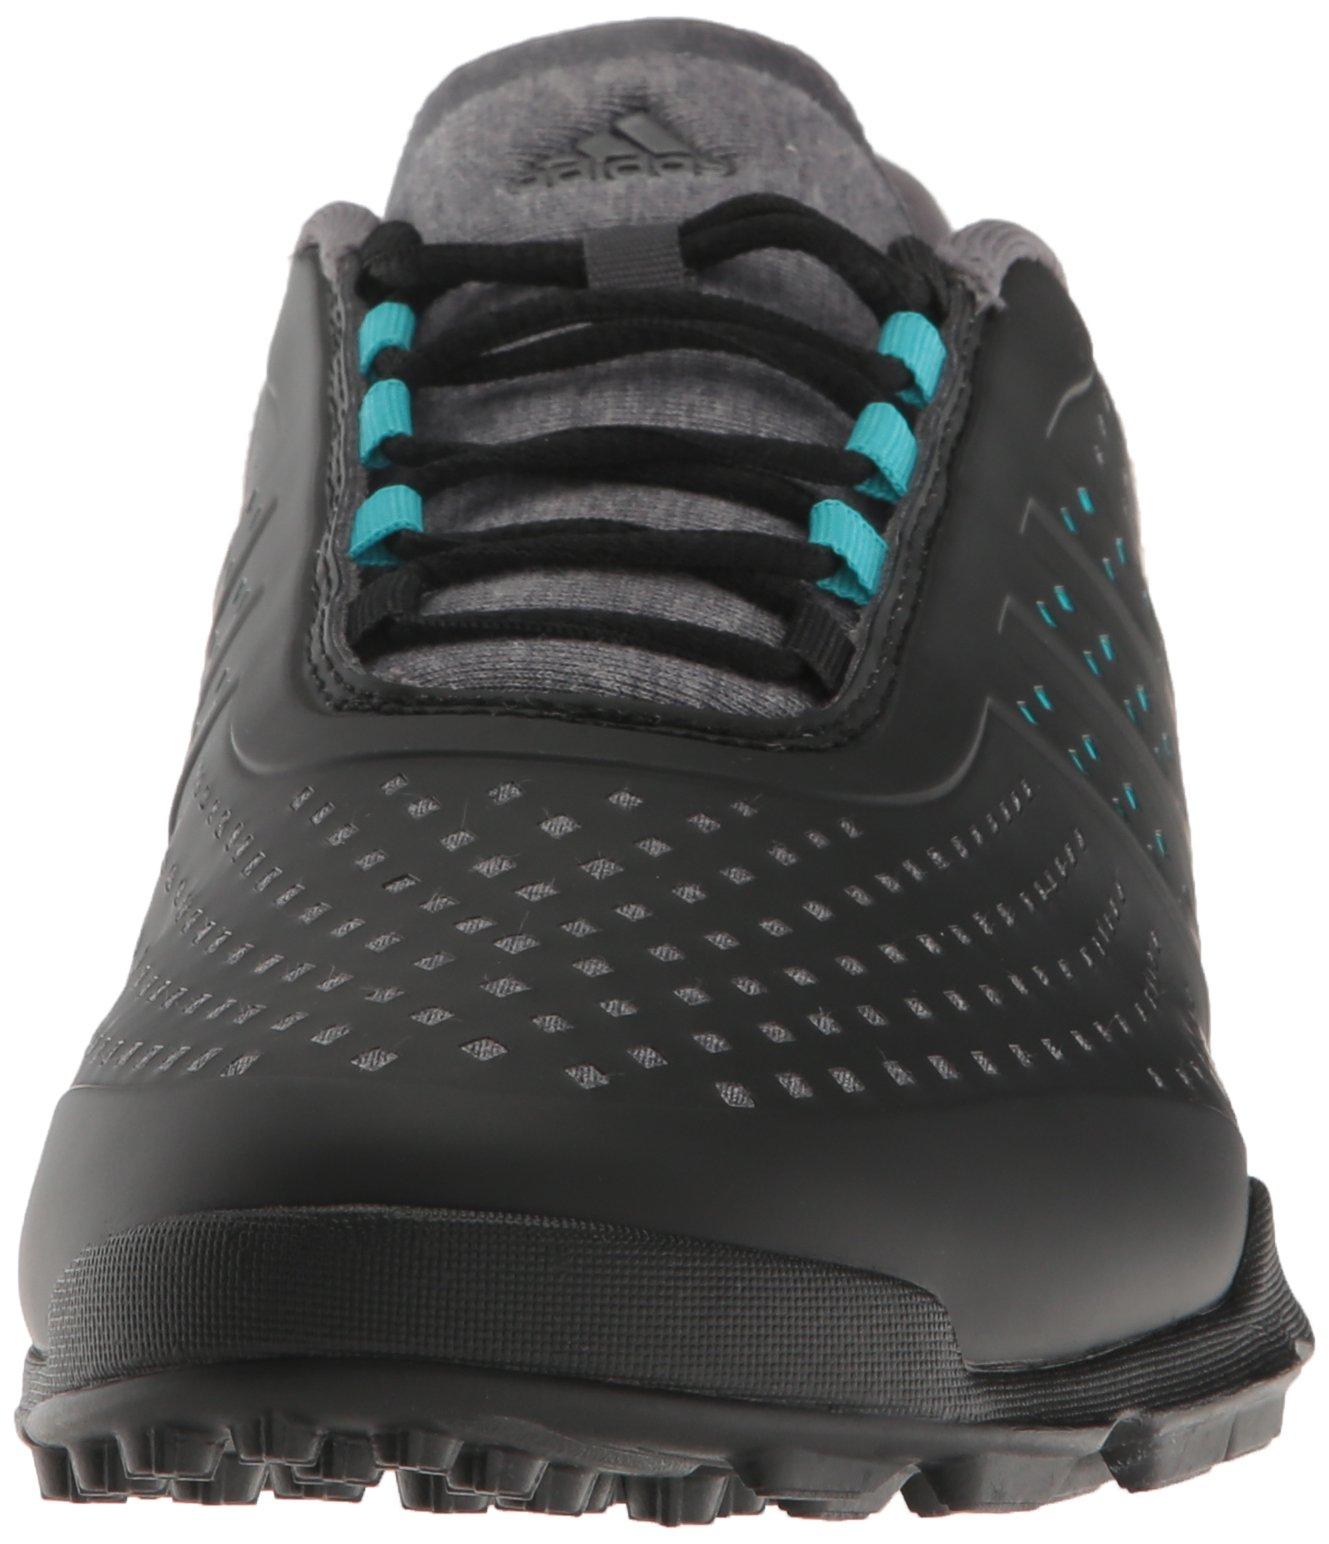 adidas Women's Adipure Sport Golf Shoe, Grey, 7 M US by adidas (Image #4)